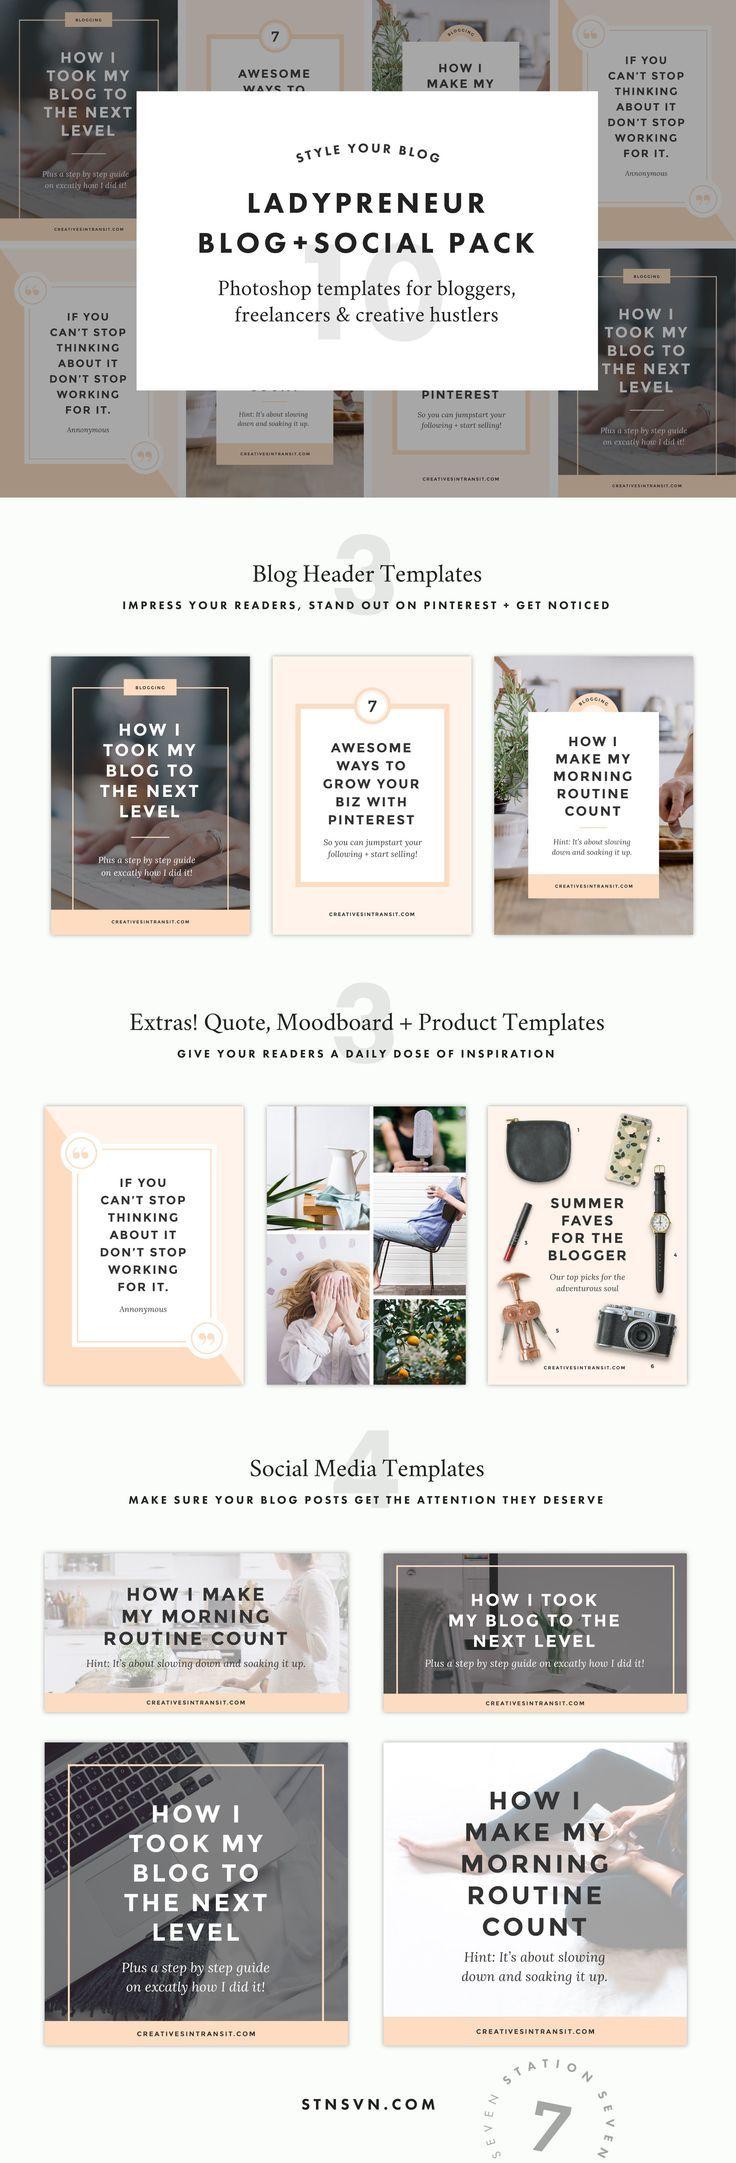 Monstera Blog Pack | Header, Template and Blog